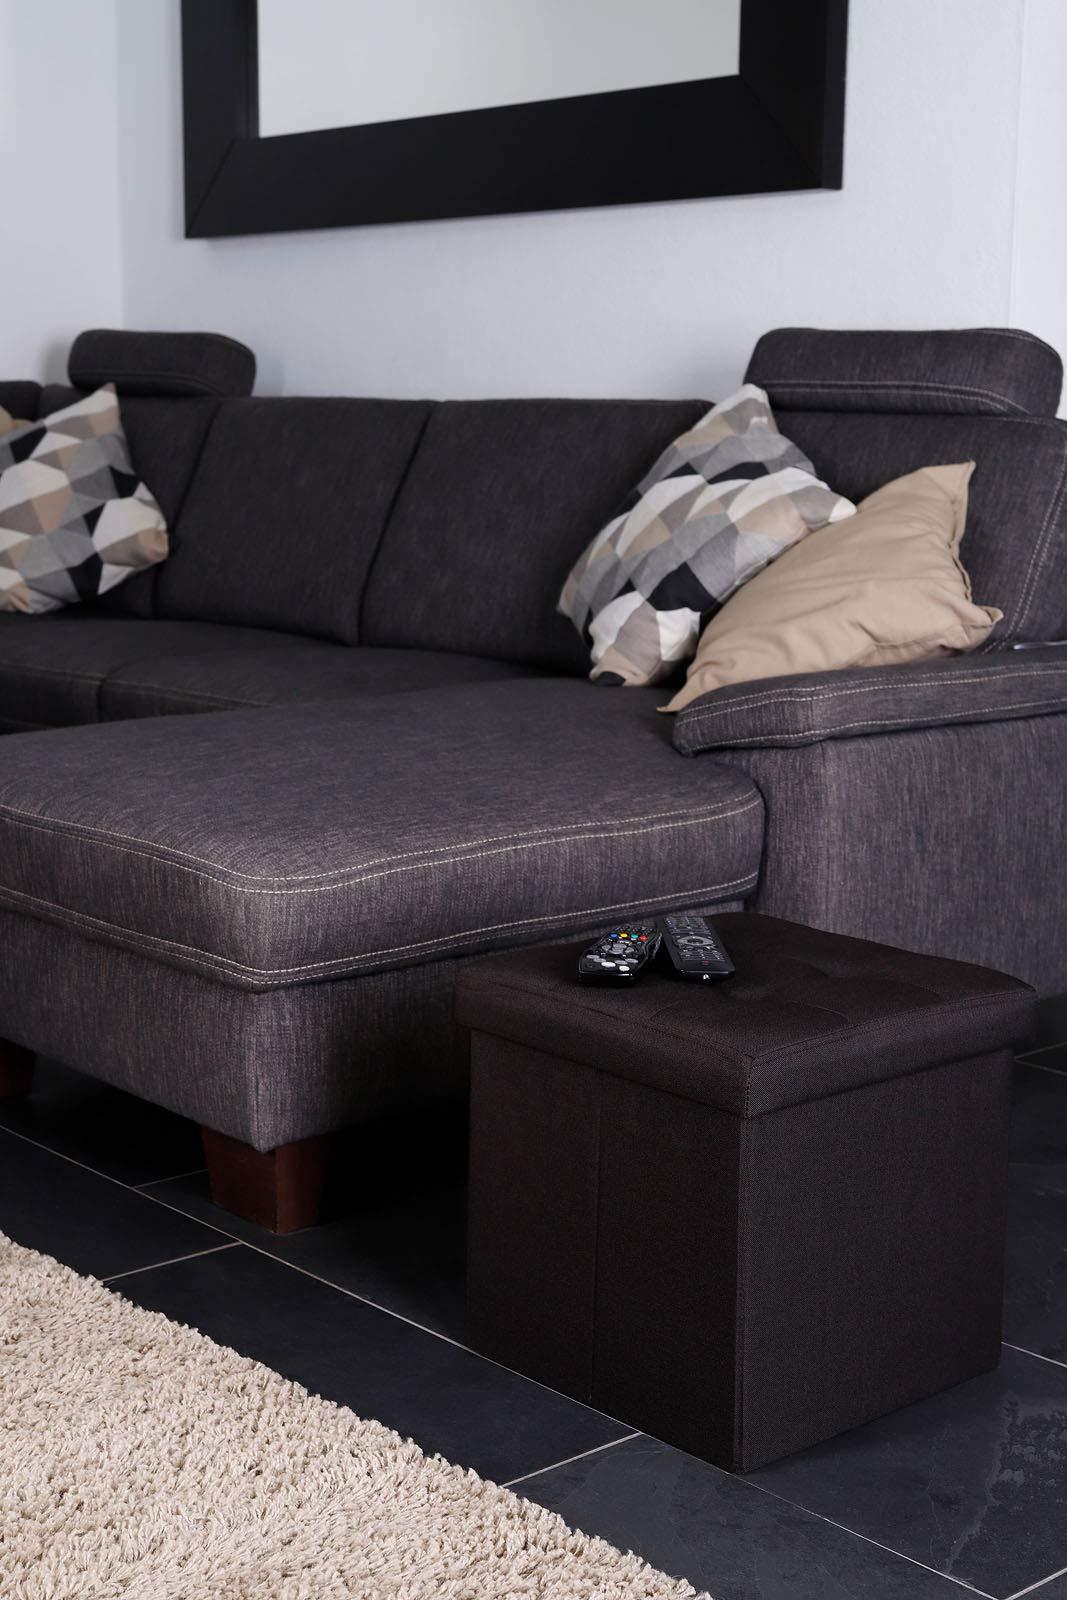 dibea SO00457, Sitzhocker faltbar, Leinen, 40 L, Cube 38 x 38 x 38 cm braun, Max 300 kg